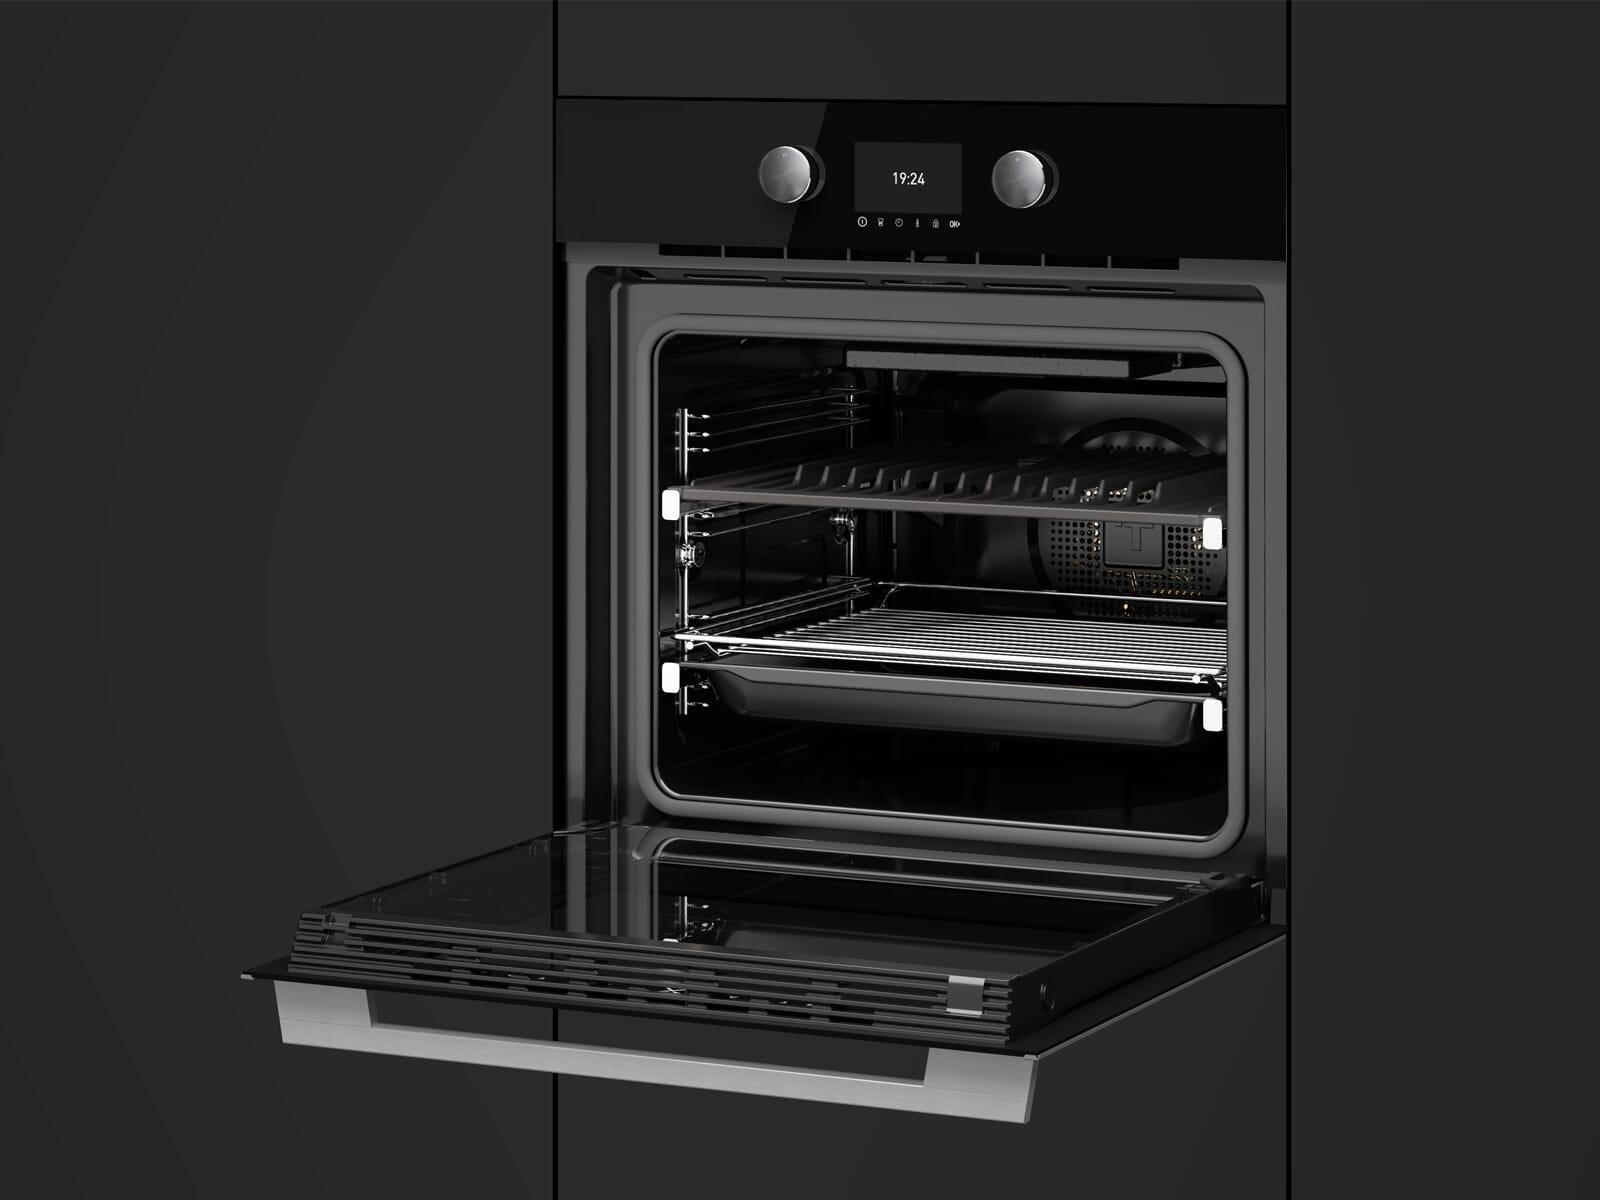 Teka SteakMaster Pyrolyse Backofen 700°C Power-Grill Black Edition inkl. Gourmet-Fleischpaket